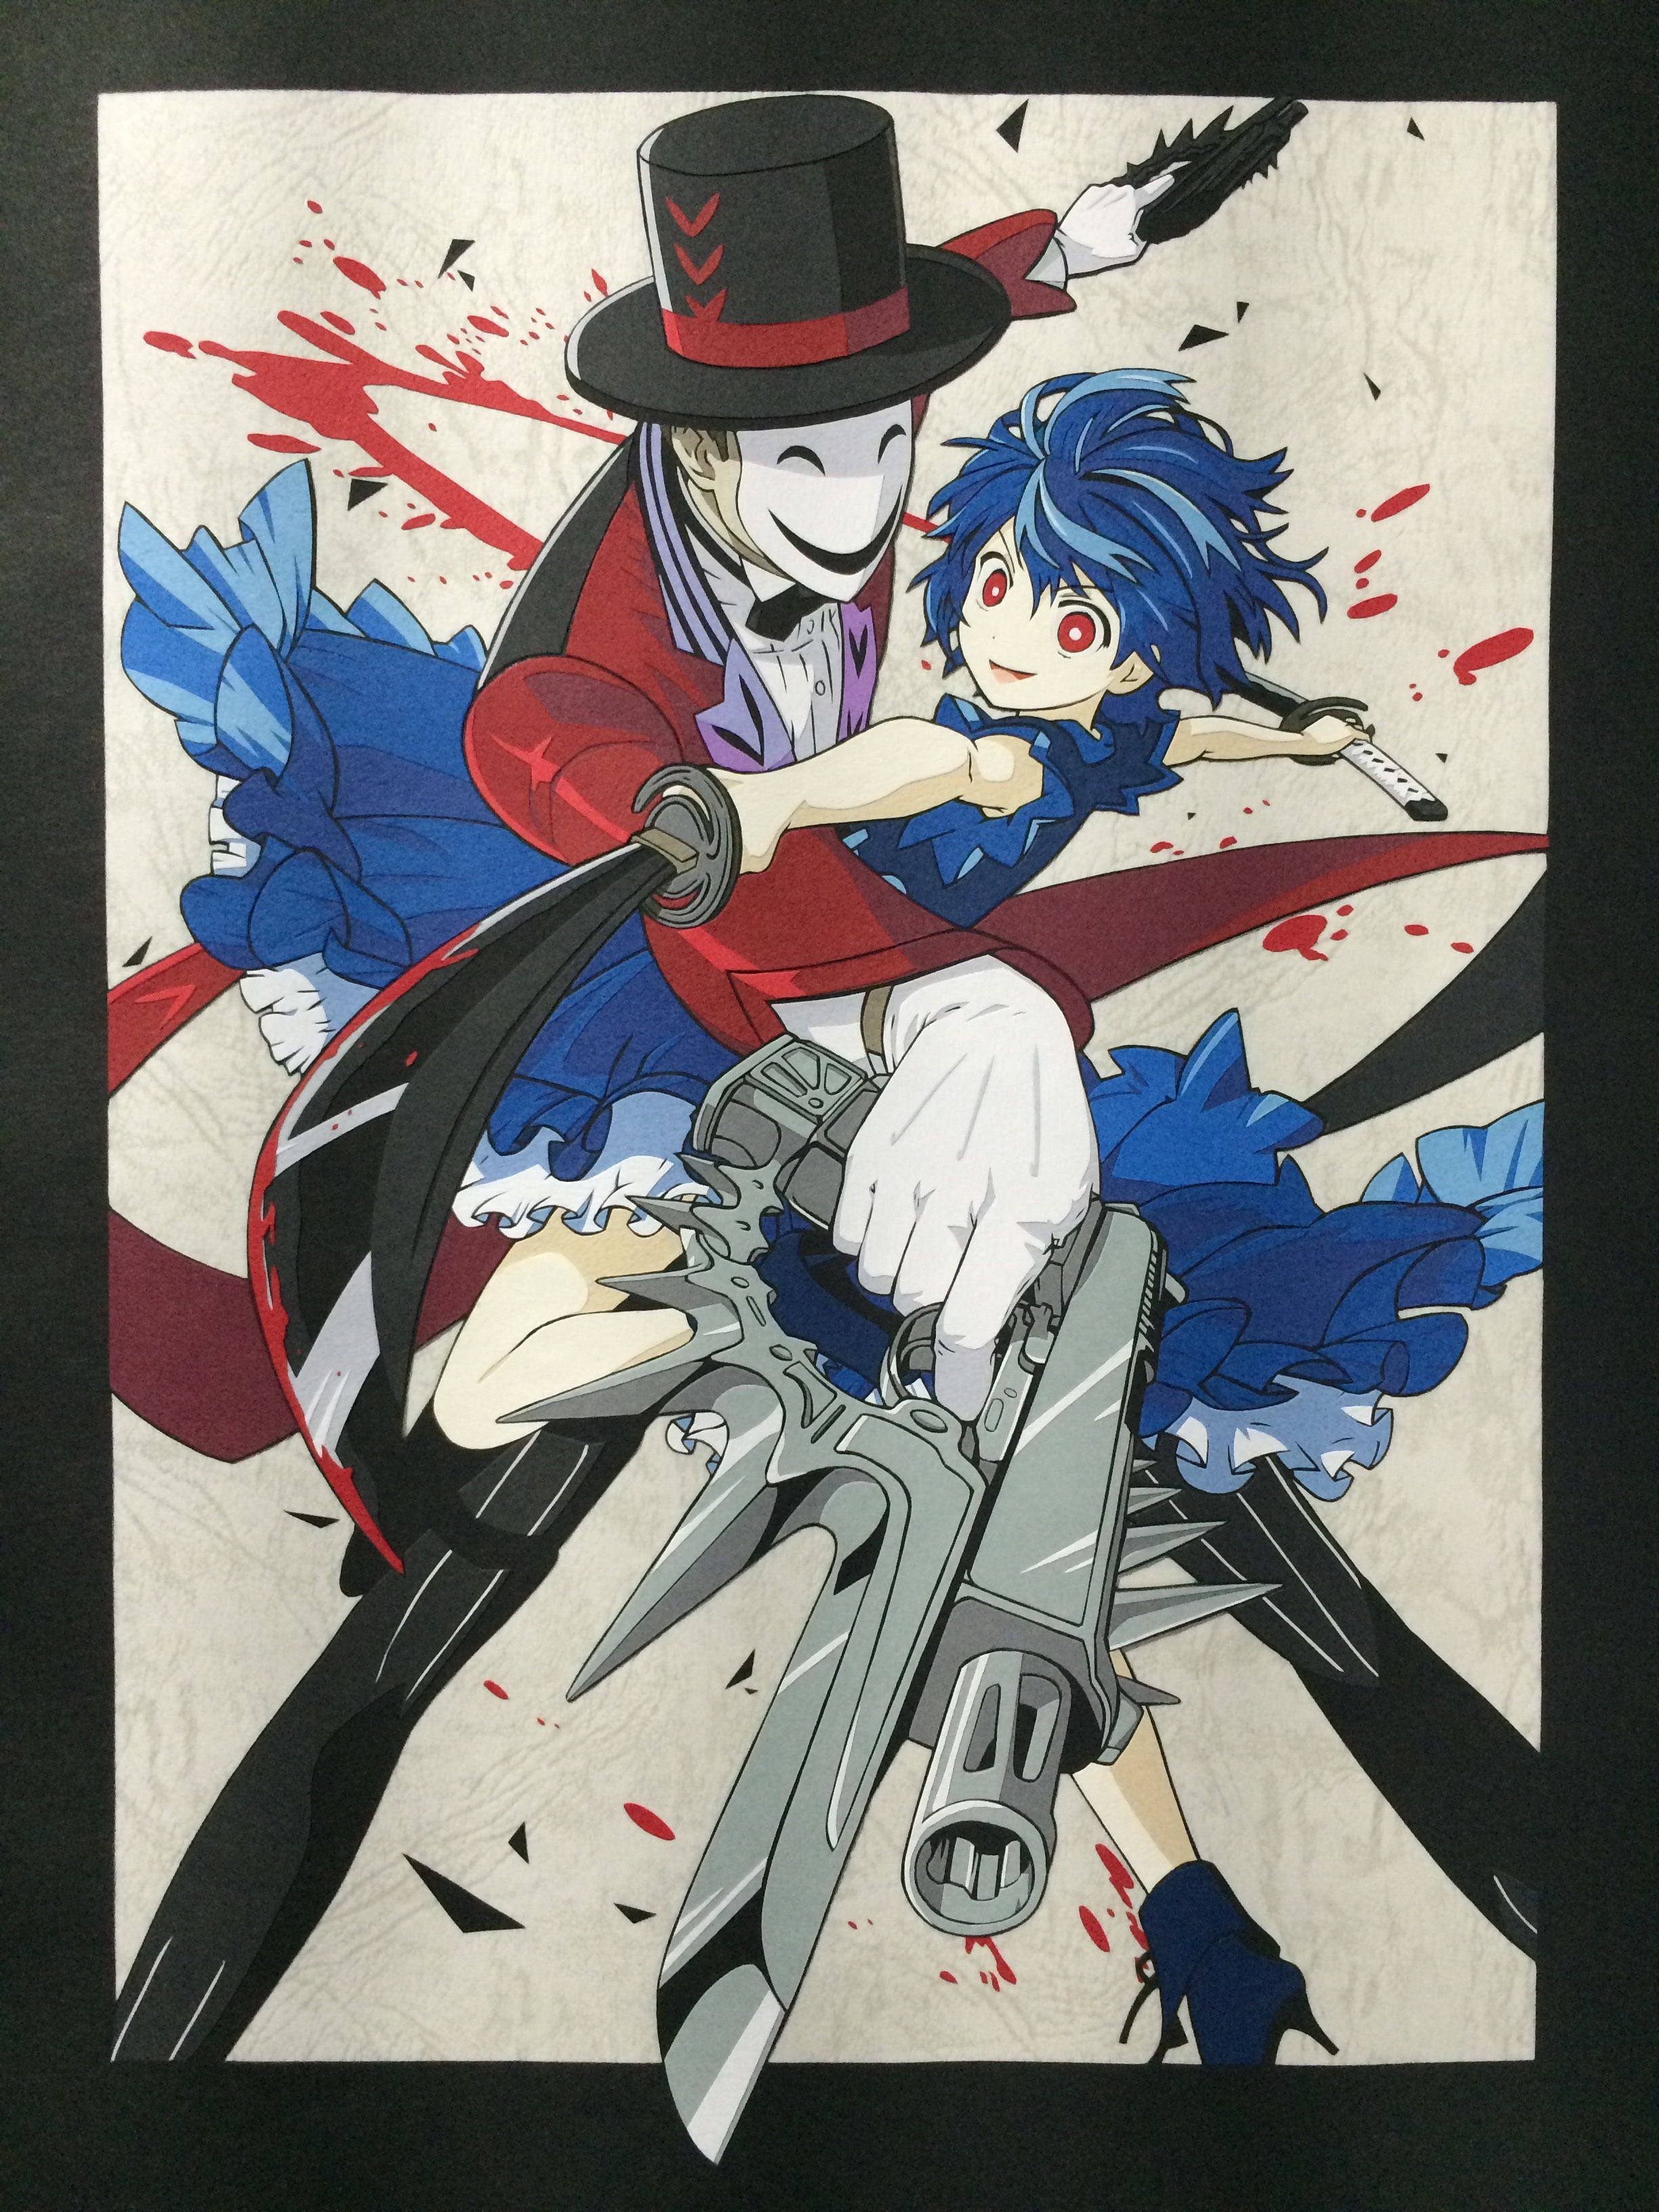 Black Bullet Kagetane Hiruko, Kohina Hiruko